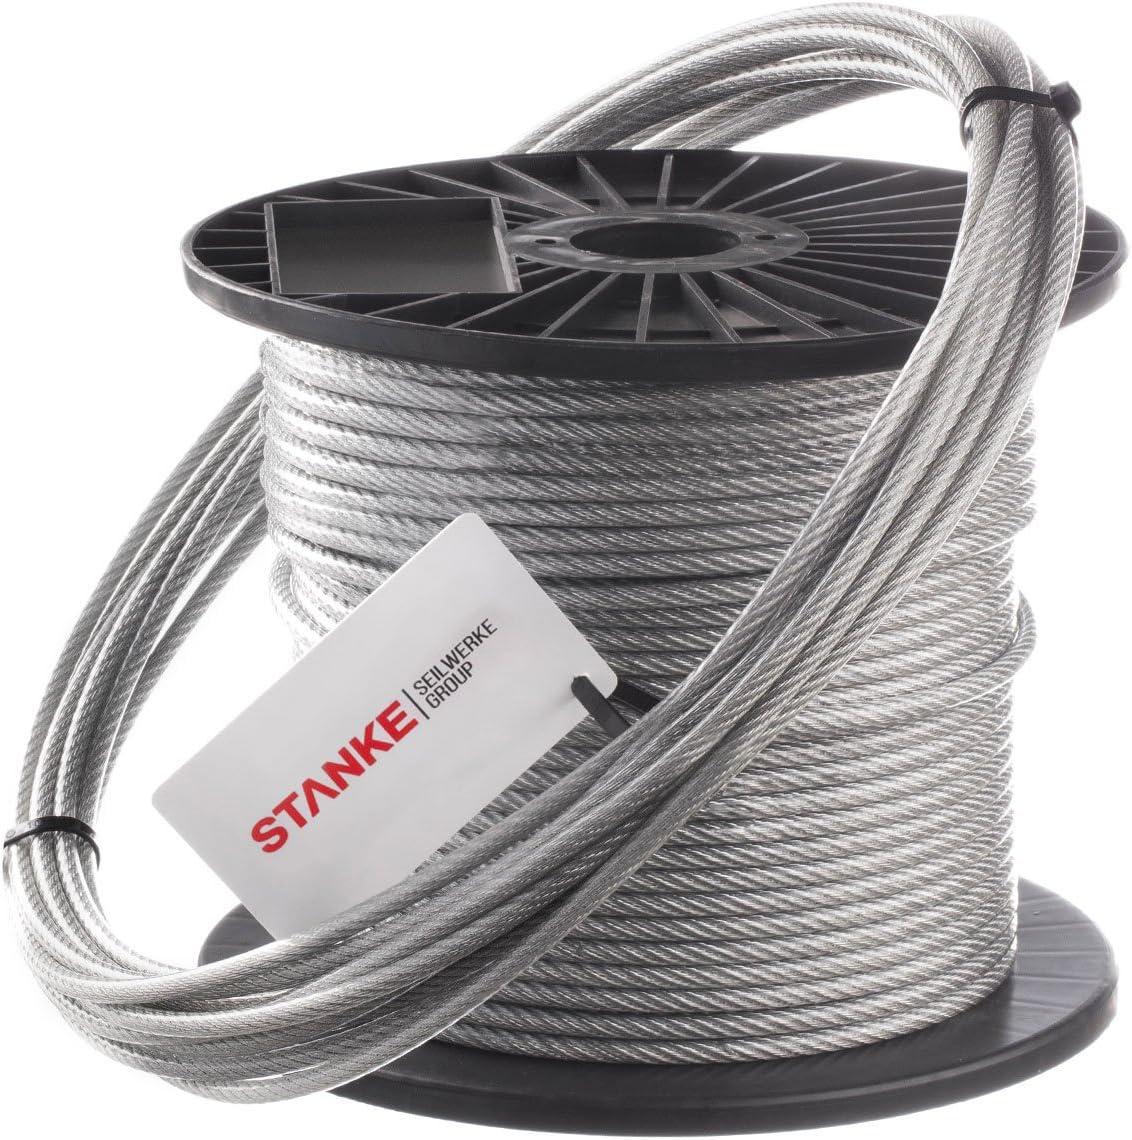 Seilwerk STANKE C/âble en Acier Inoxydable en PVC 4 mm 7x7 Cordage en Acier Inoxydable INOX V4A A4